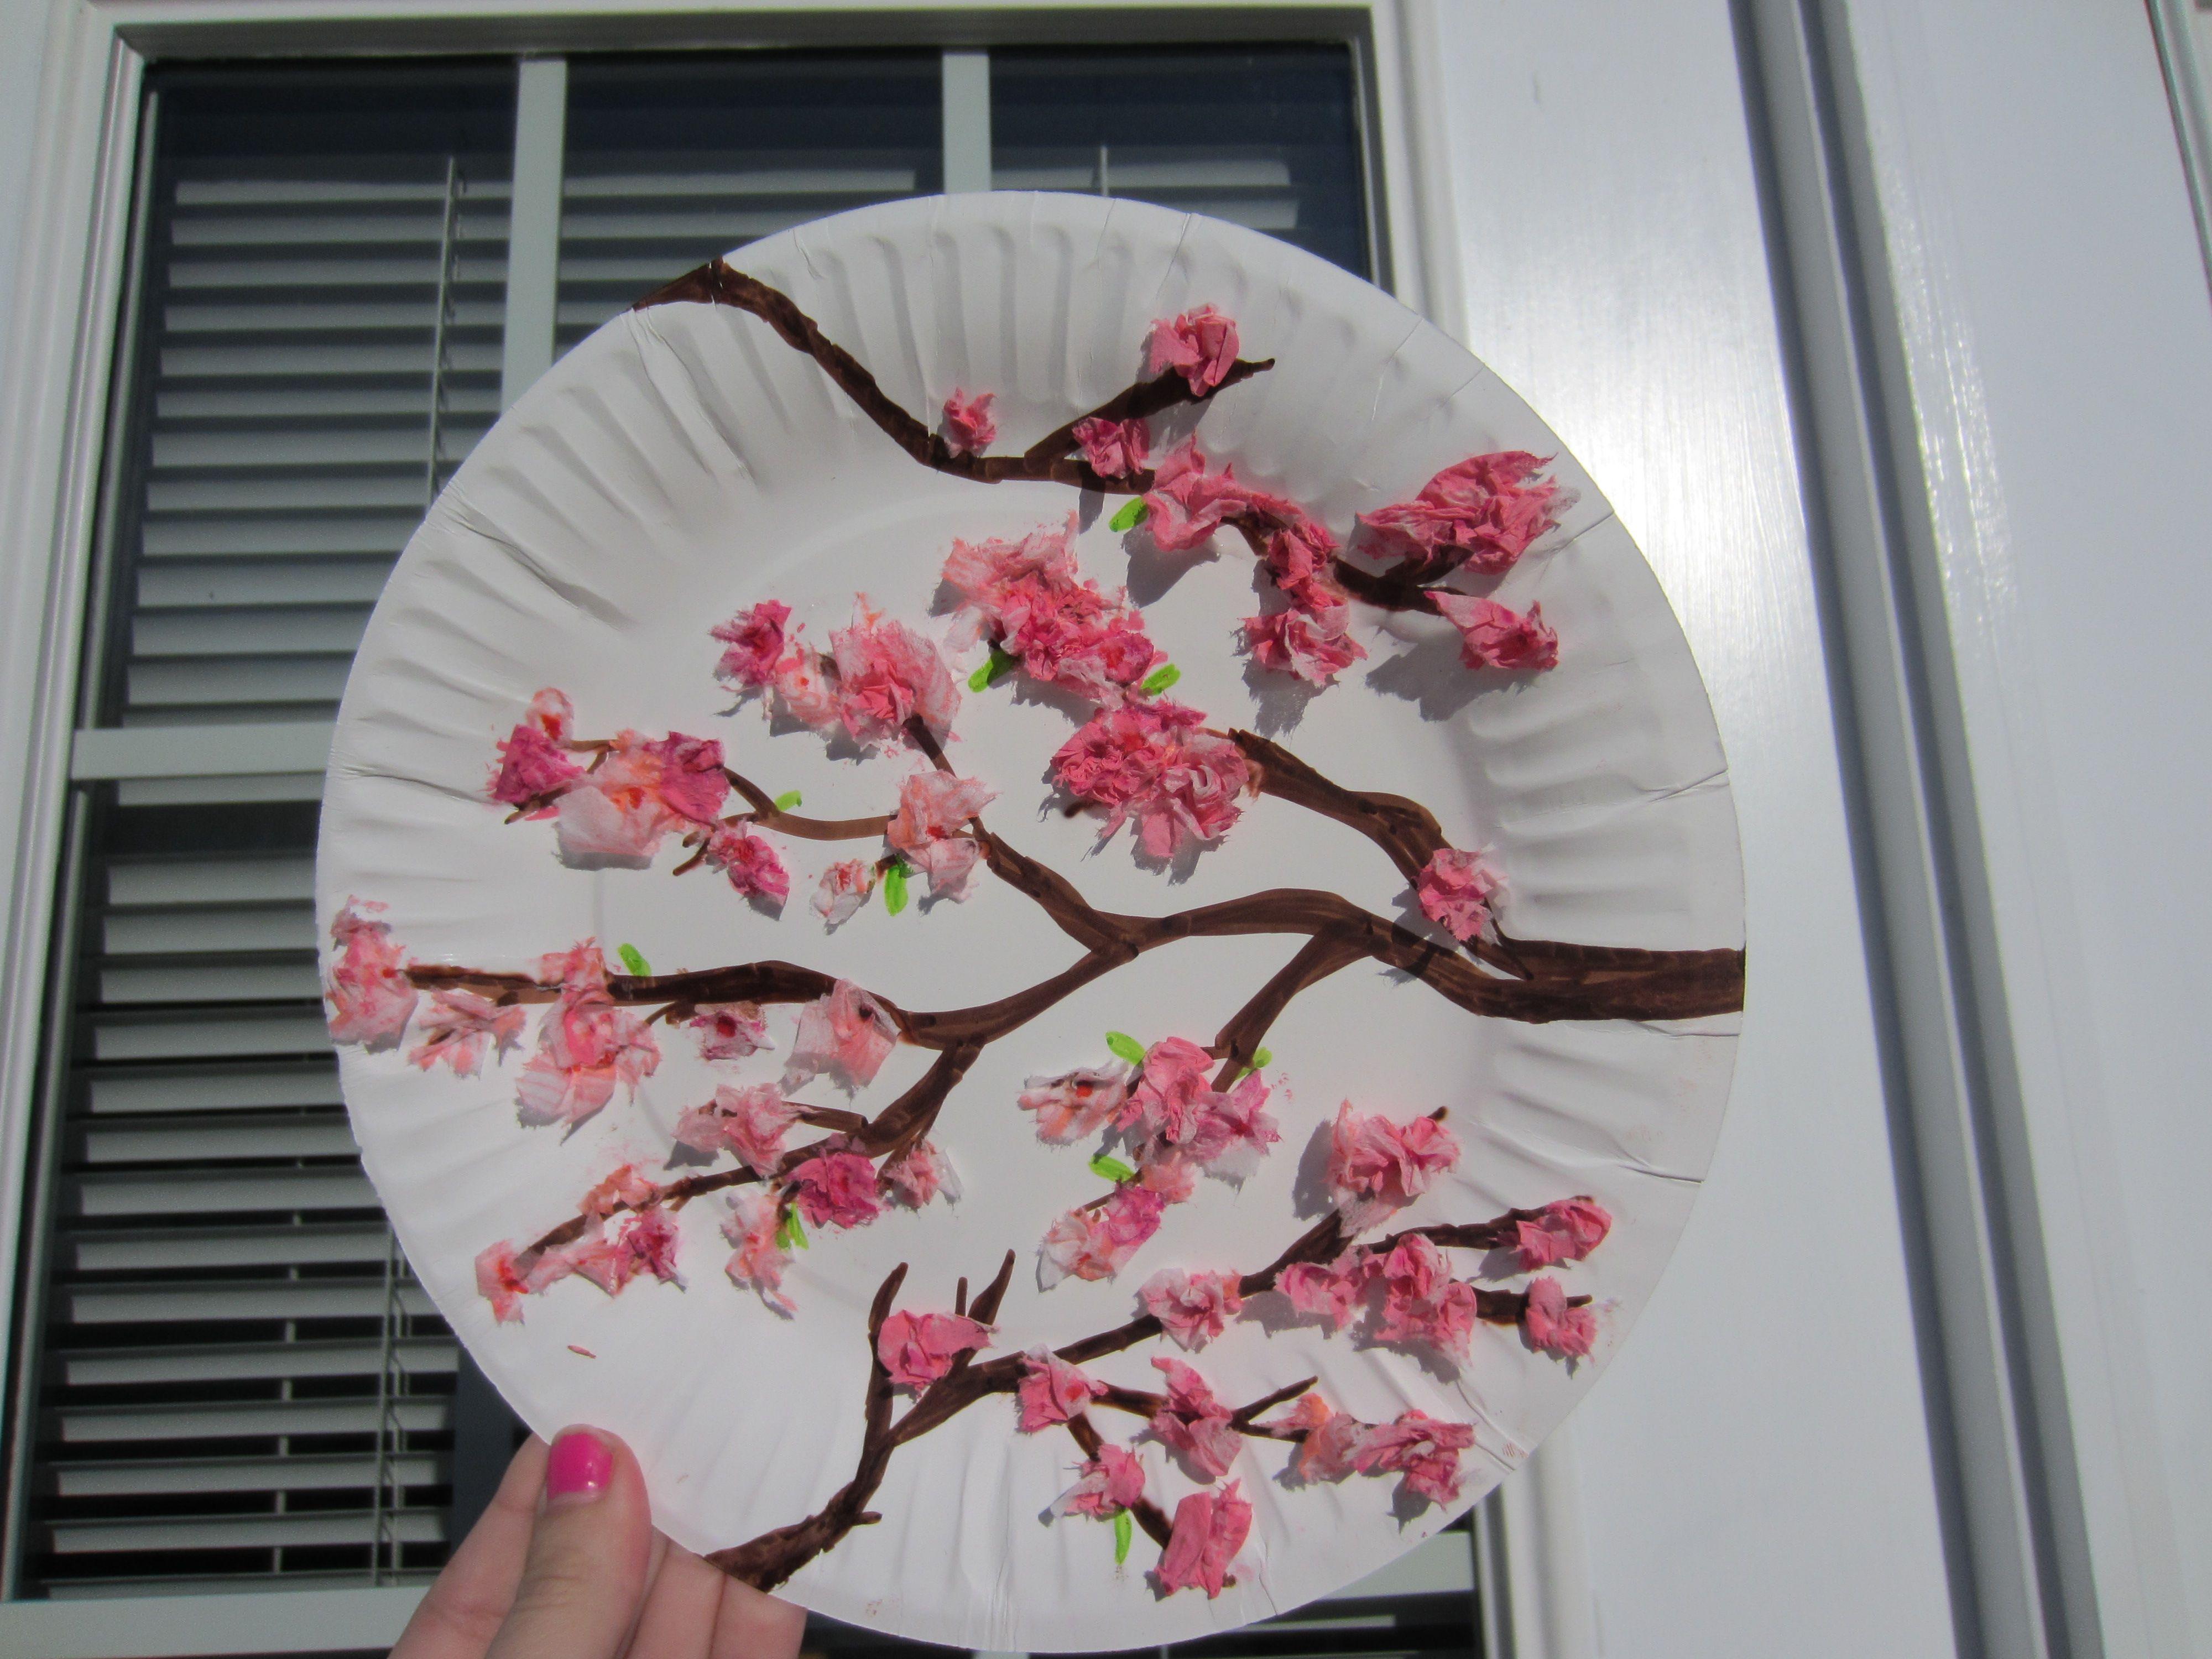 5 No Directive Cherry Blossom Art